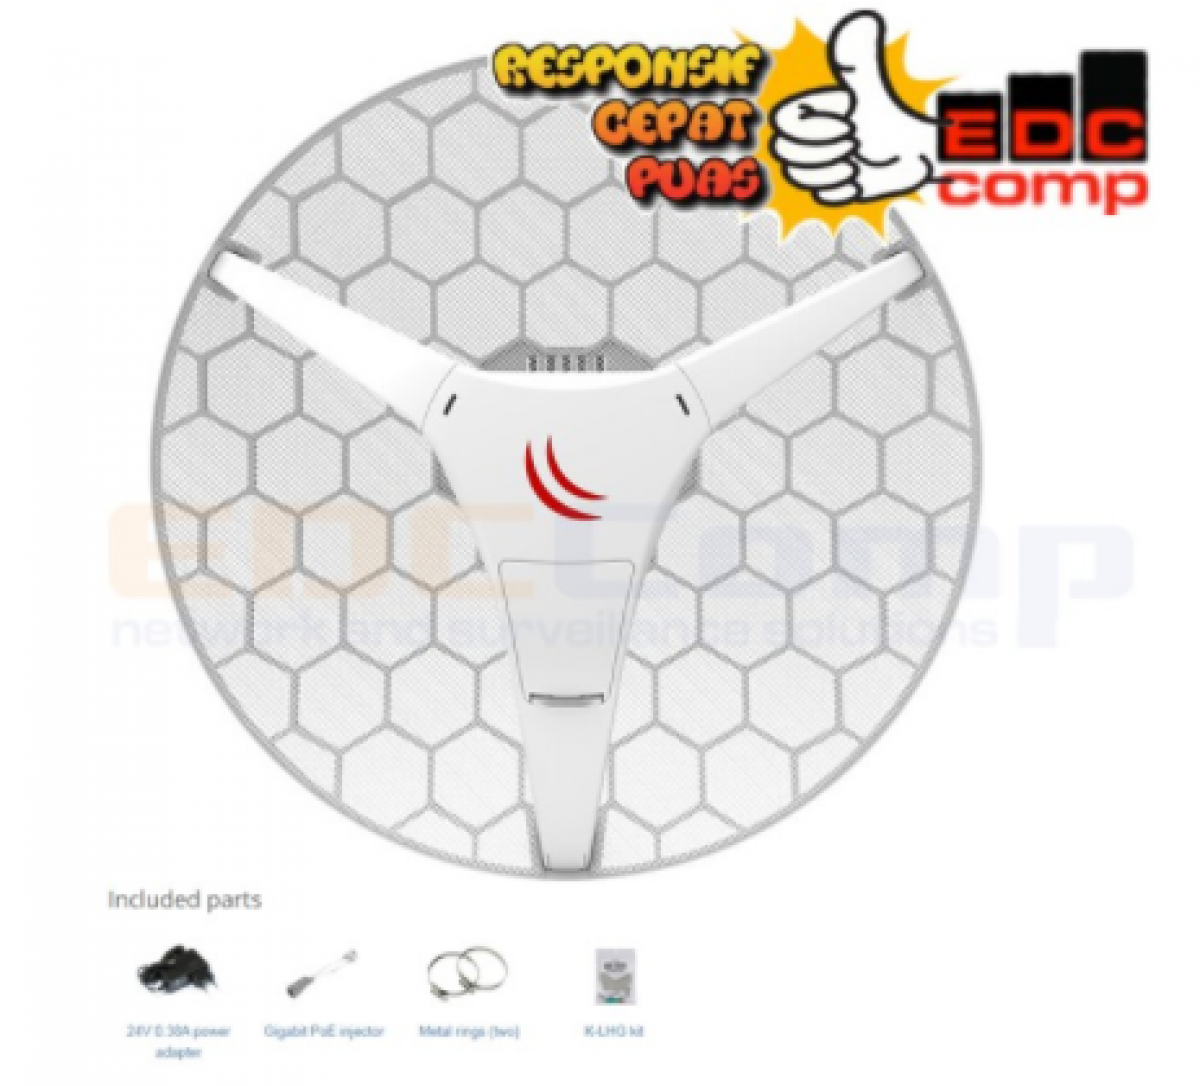 Embedded Wireless MikroTik RBLHGG-5acD / RB LHGG 5ACD / RB LHG - EdcComp